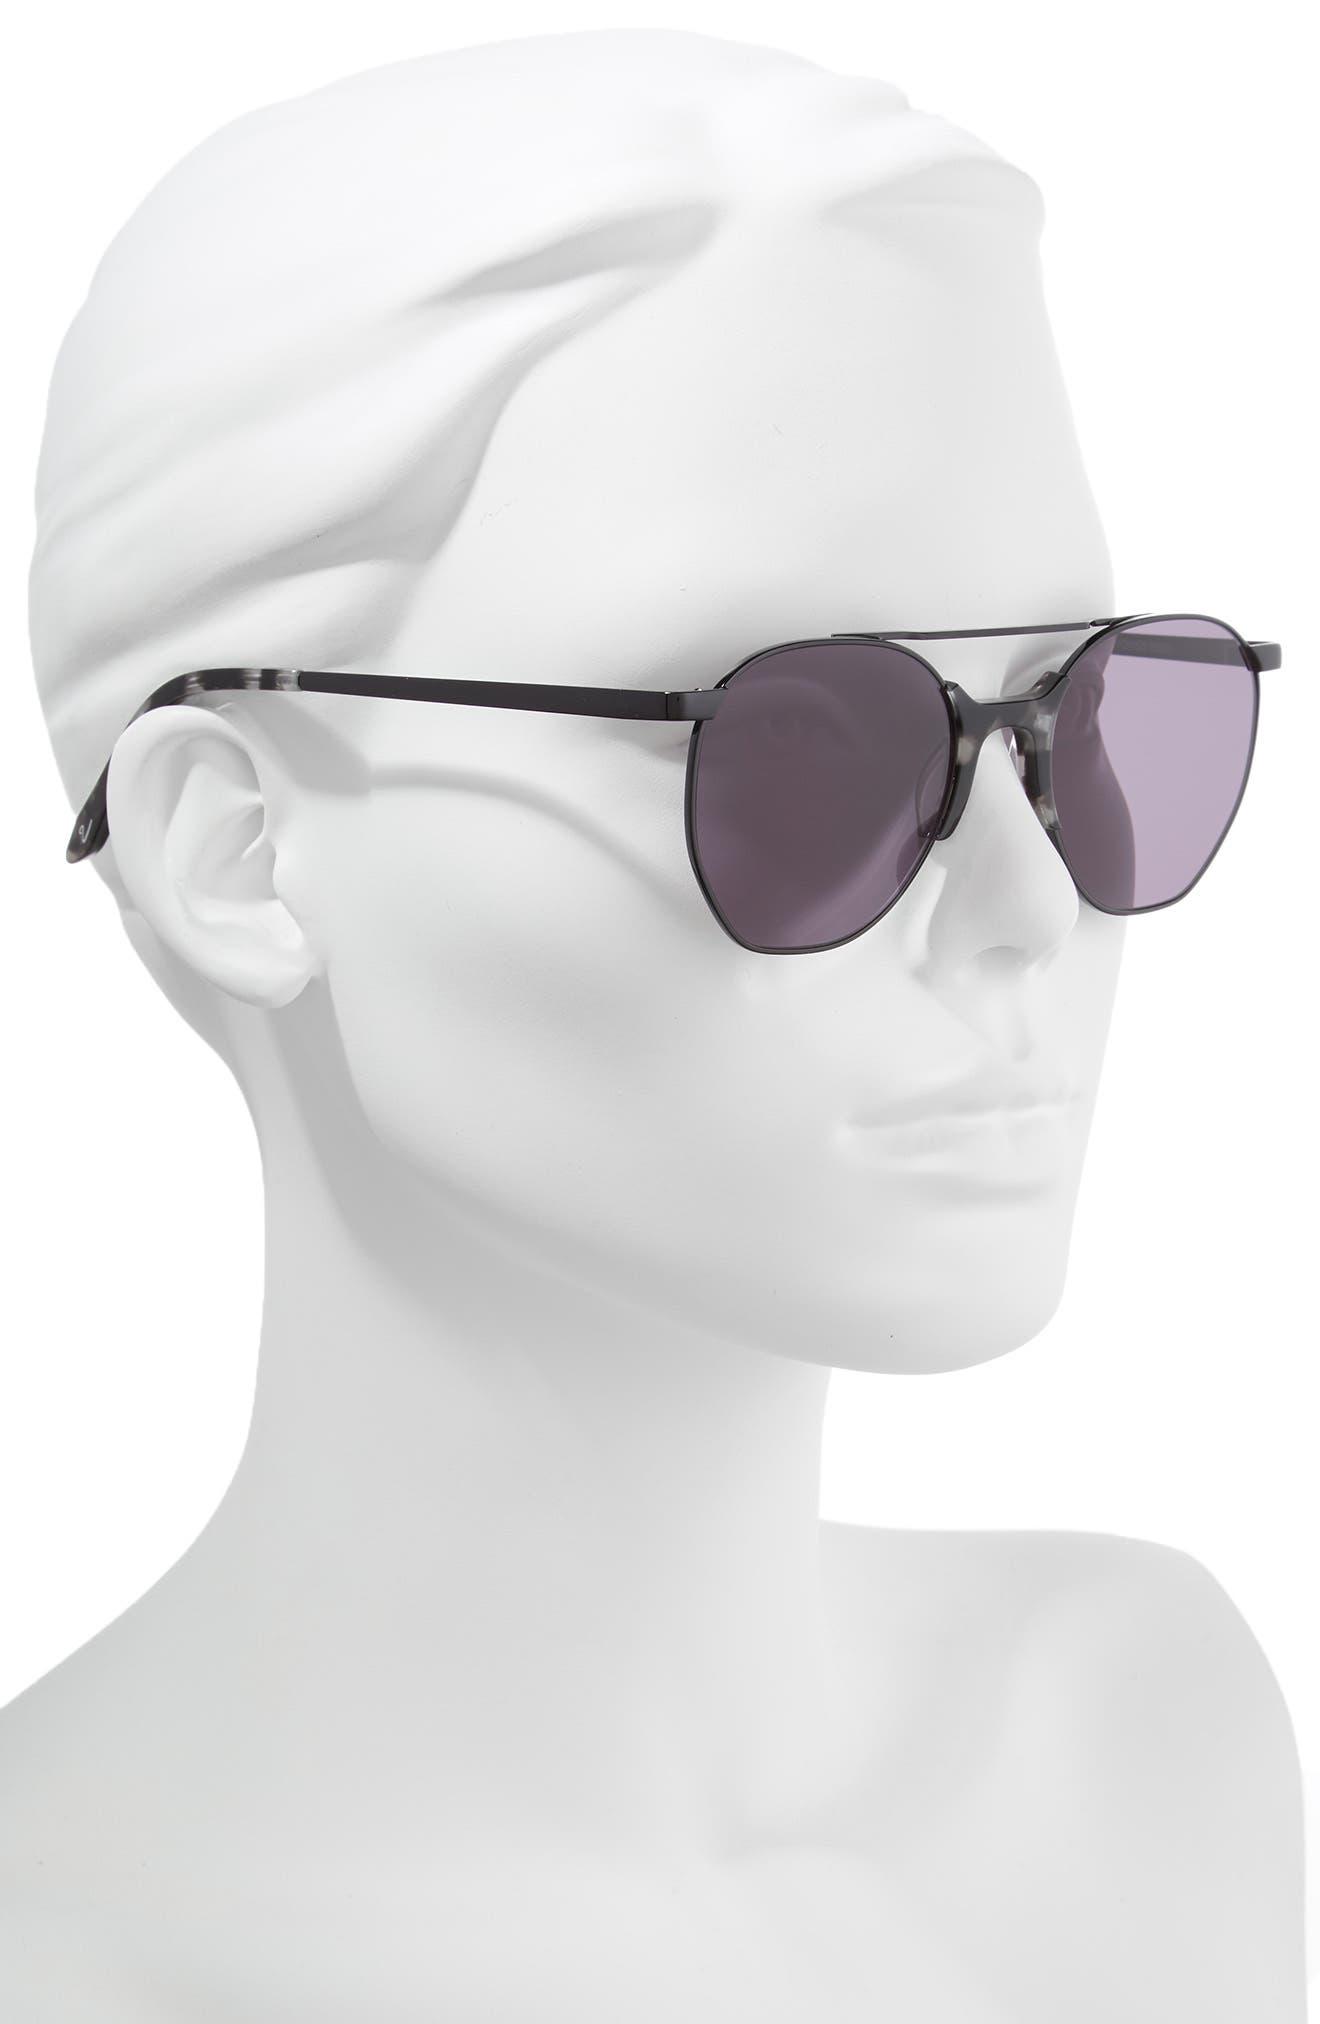 Raine 52mm Aviator Sunglasses,                             Alternate thumbnail 2, color,                             SMOKE TORTOISE/ BLACK